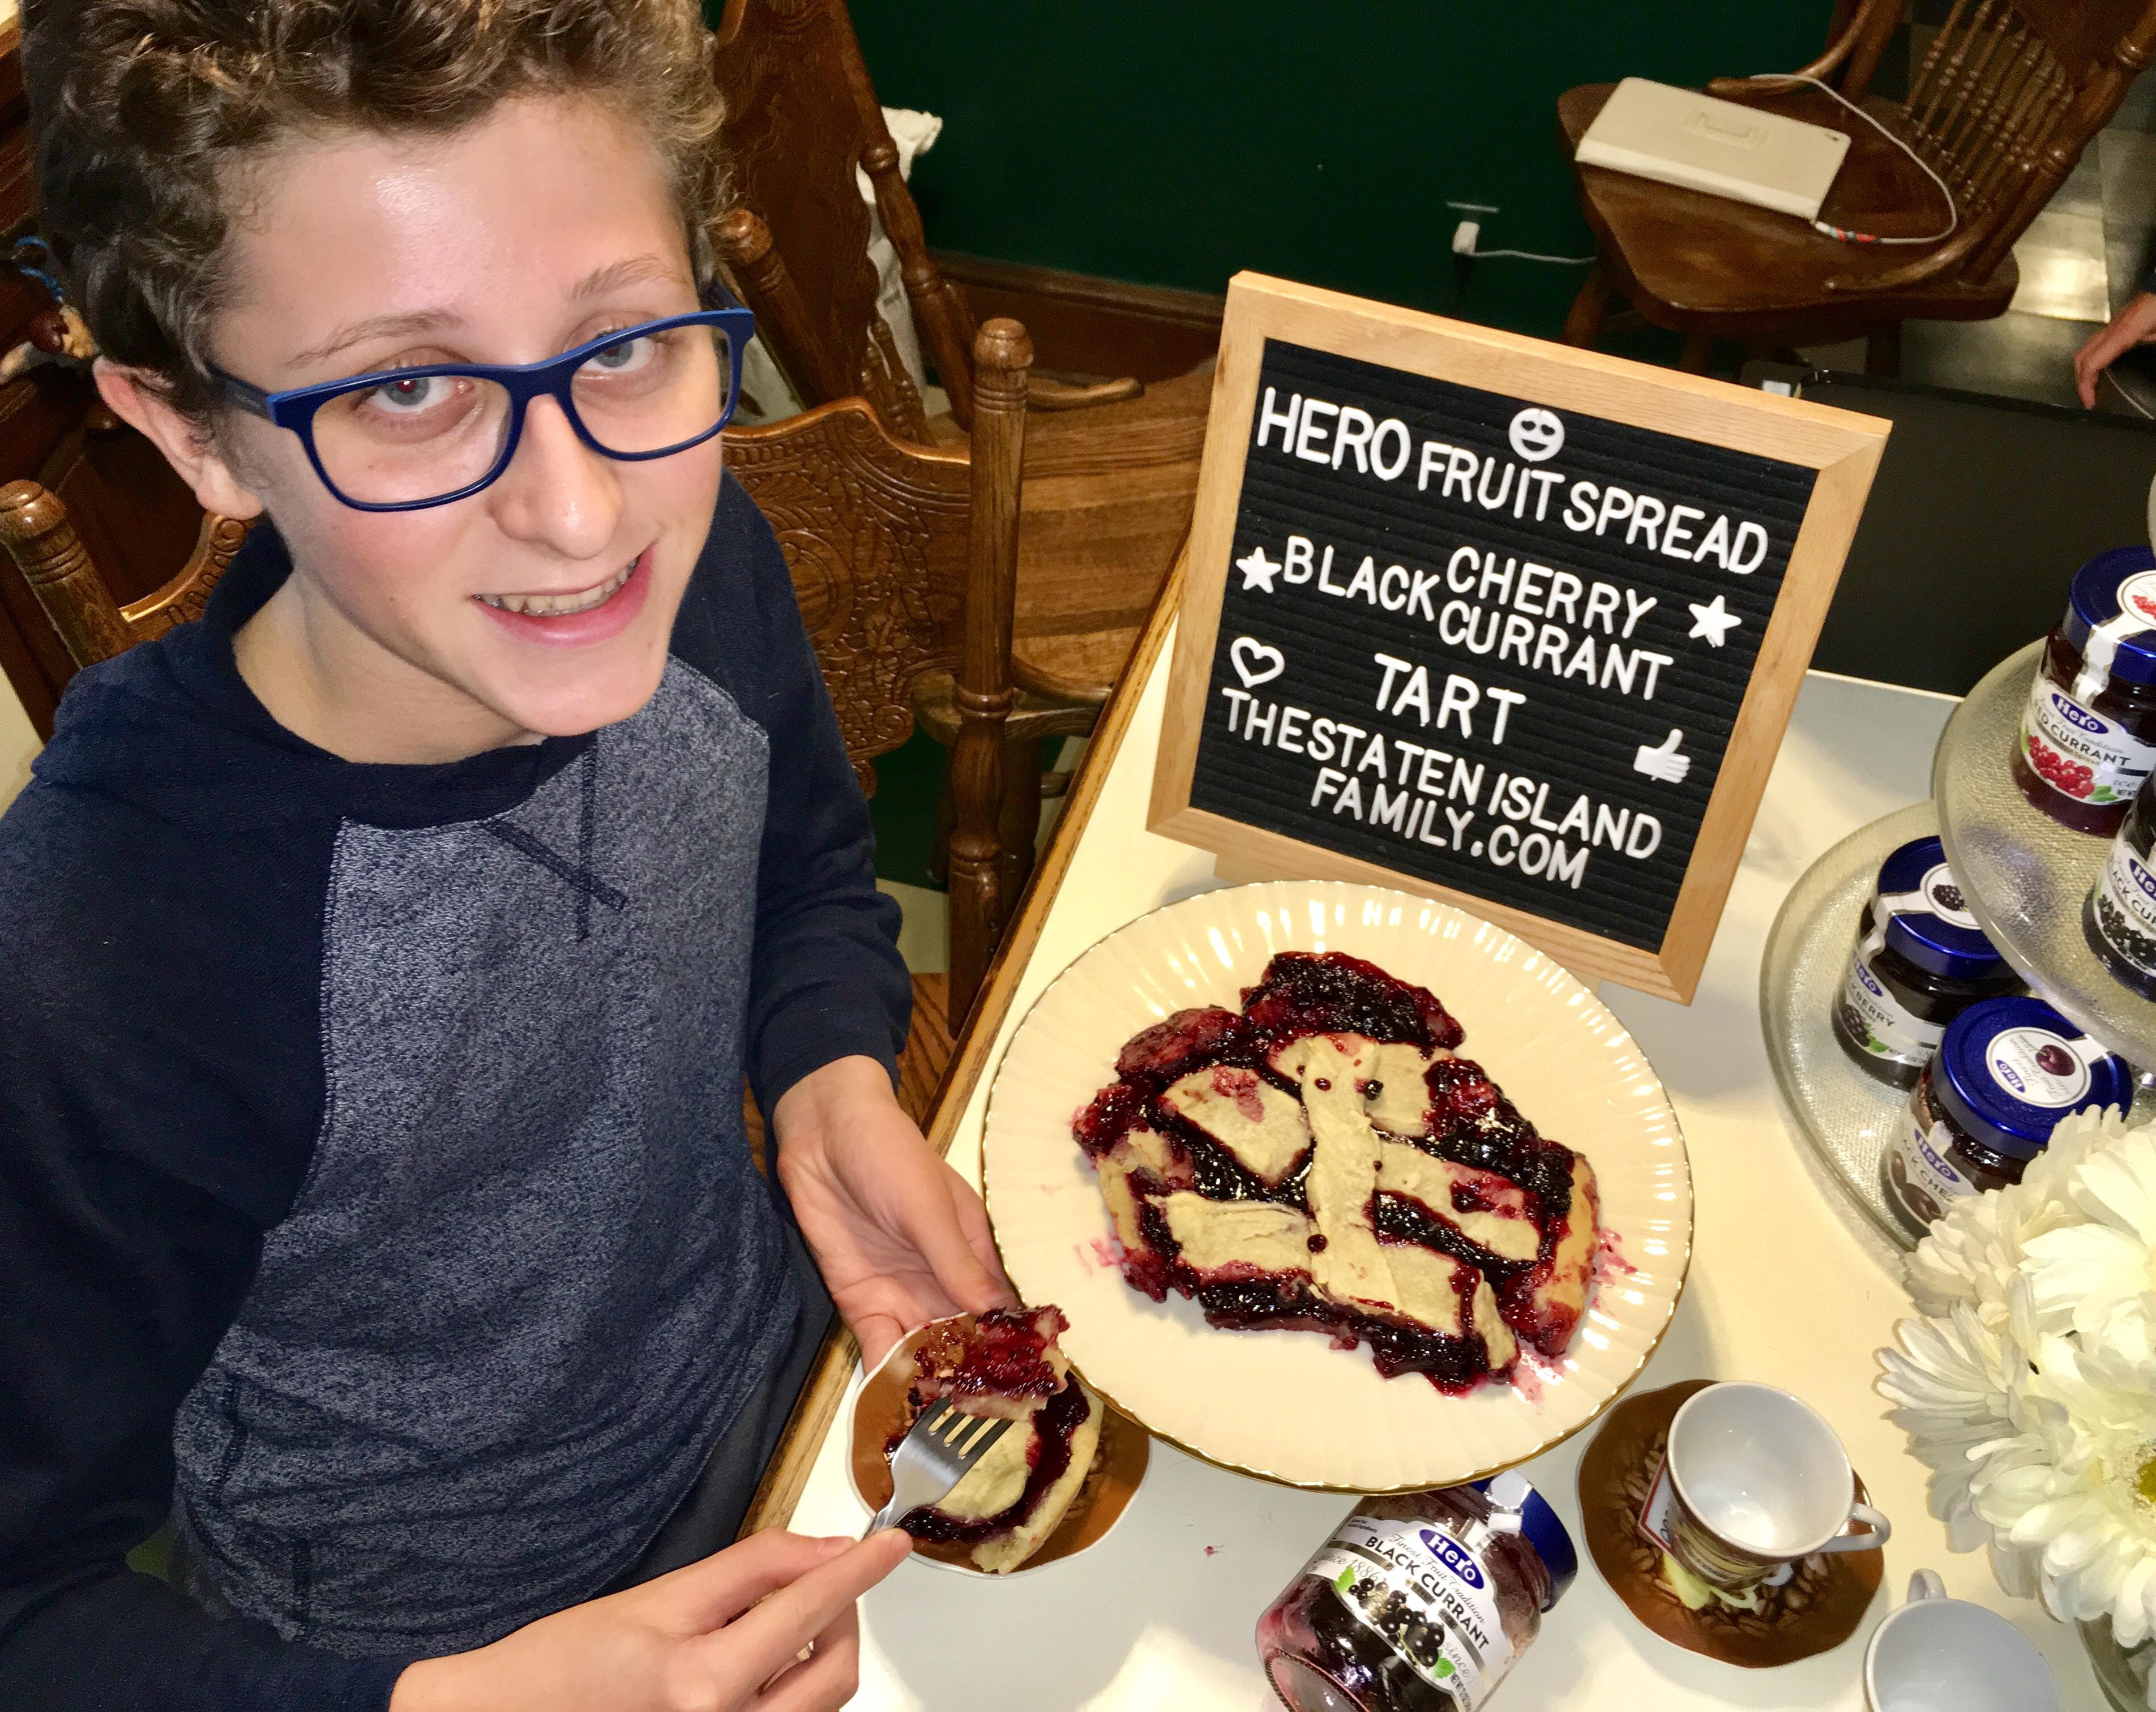 This Vegan Hero Fruit Black Cherry and Black Currant Tart Recipe is EVERYTHING